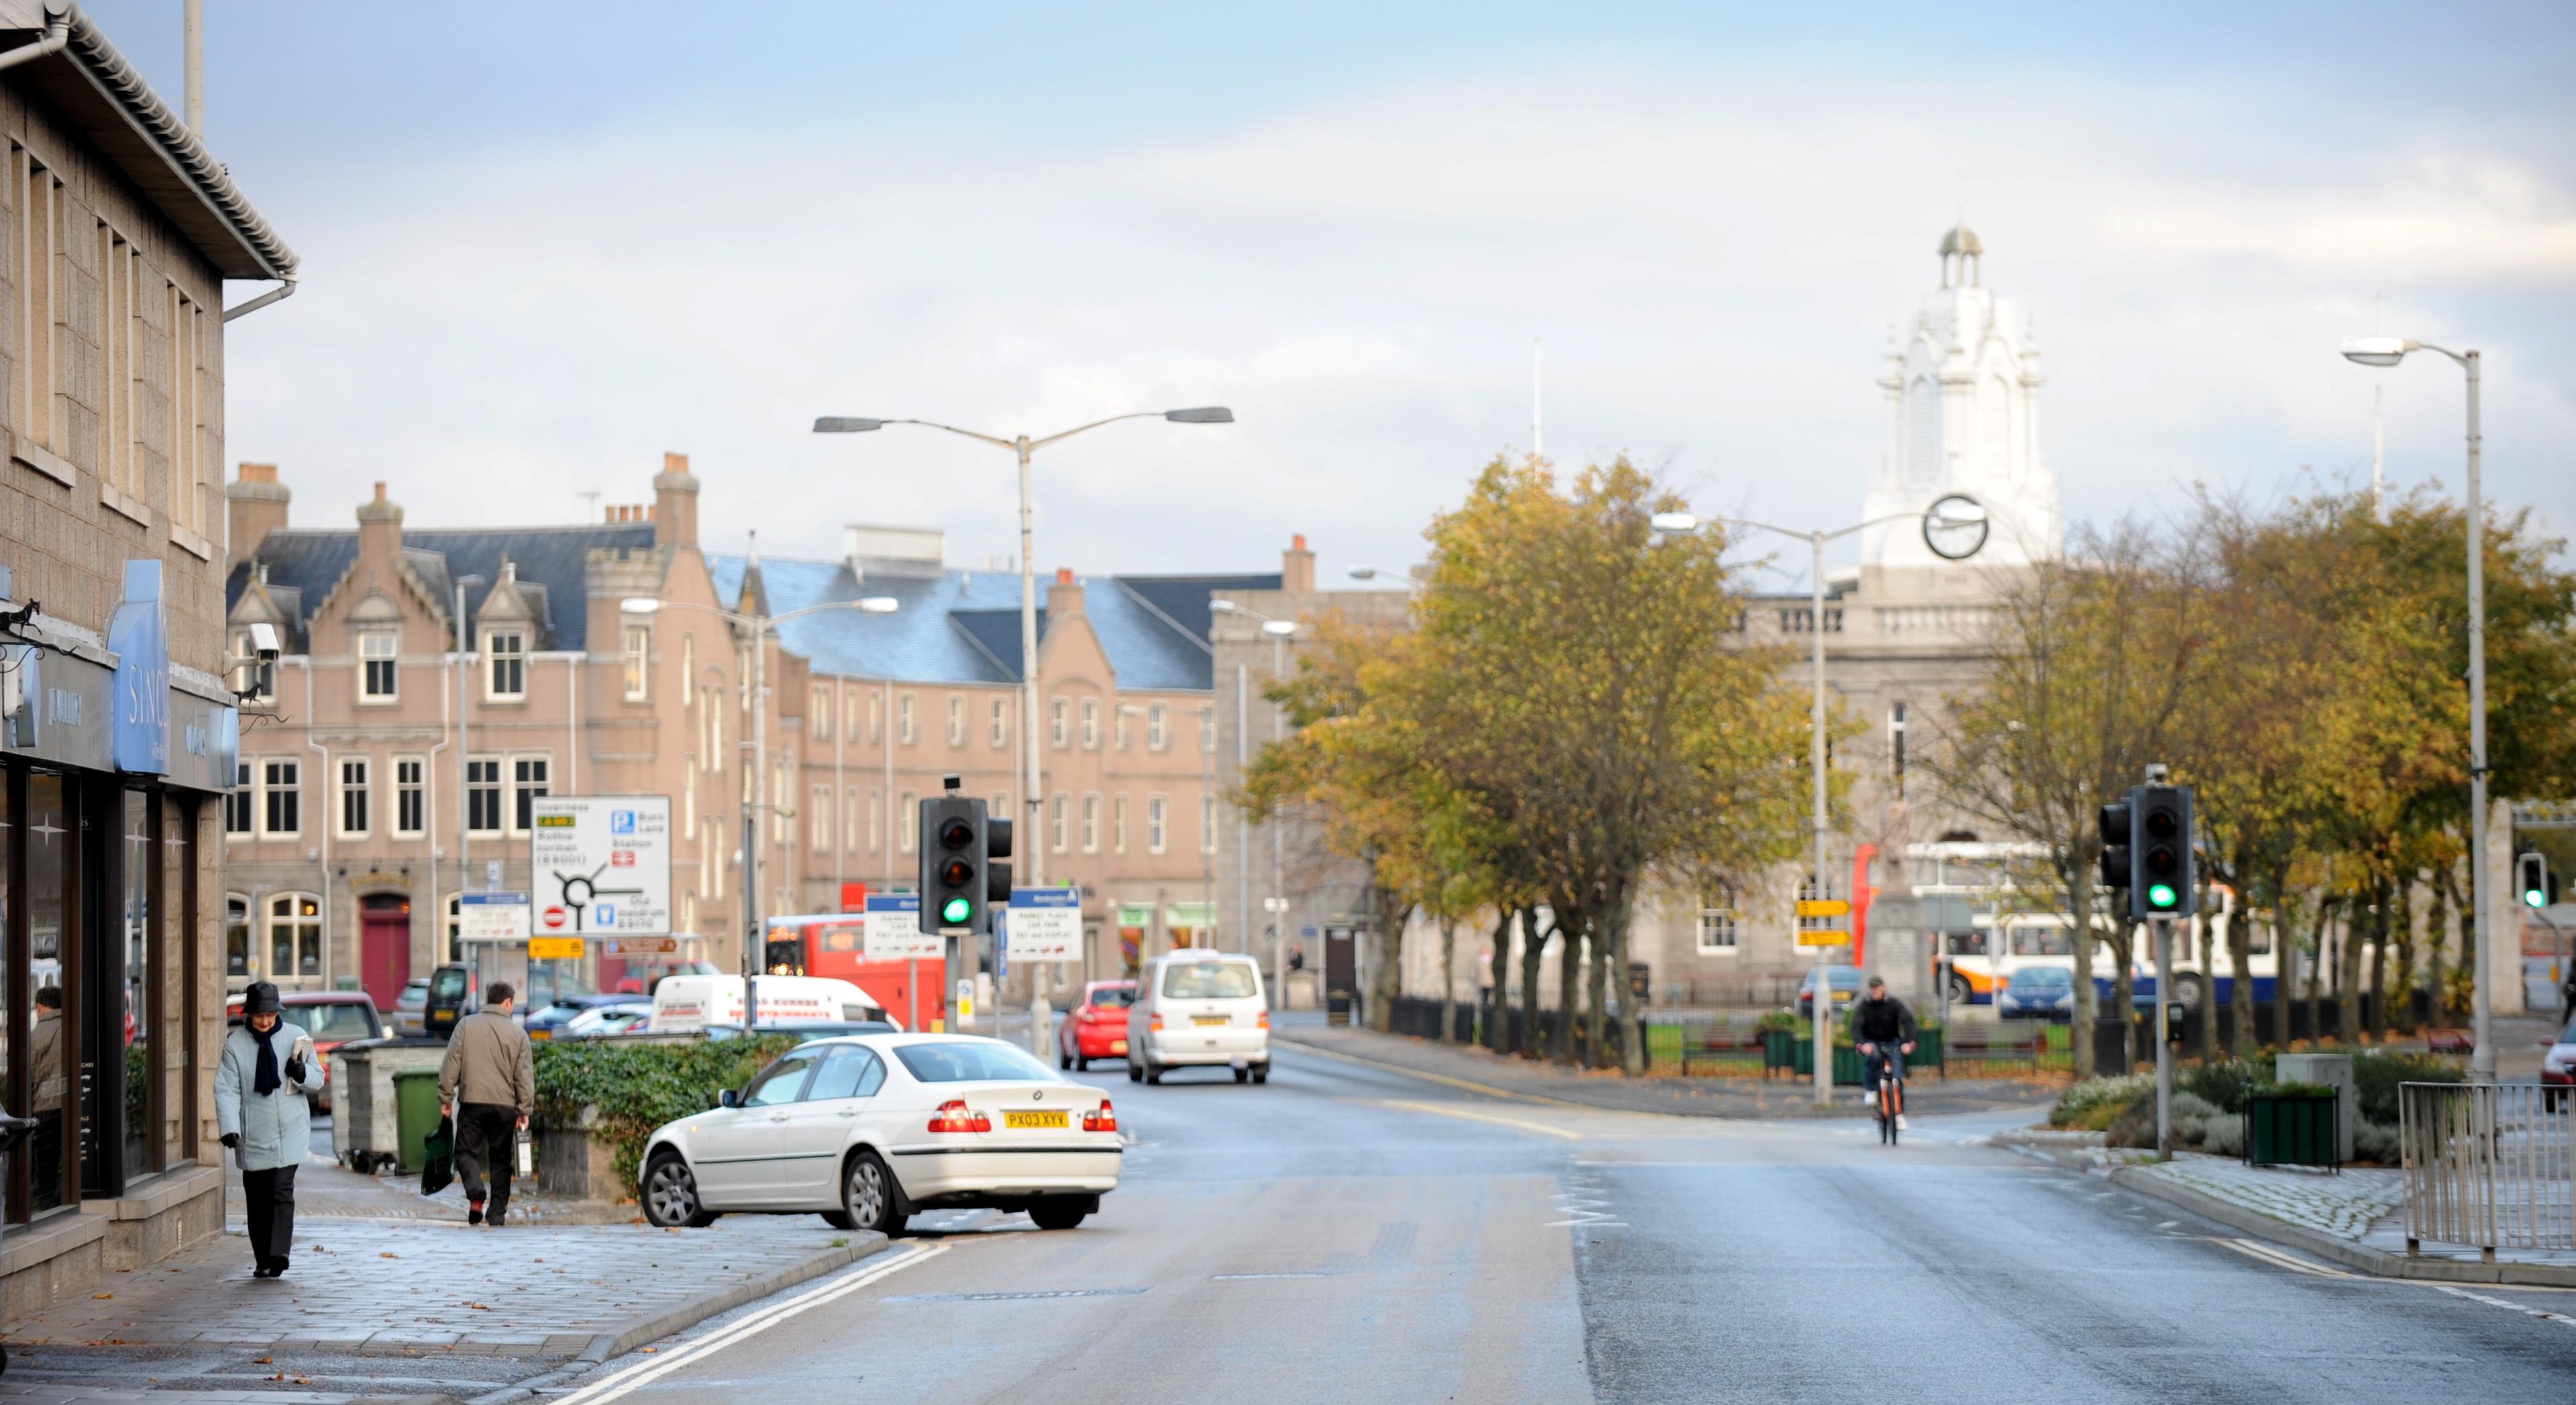 Inverurie town centre.